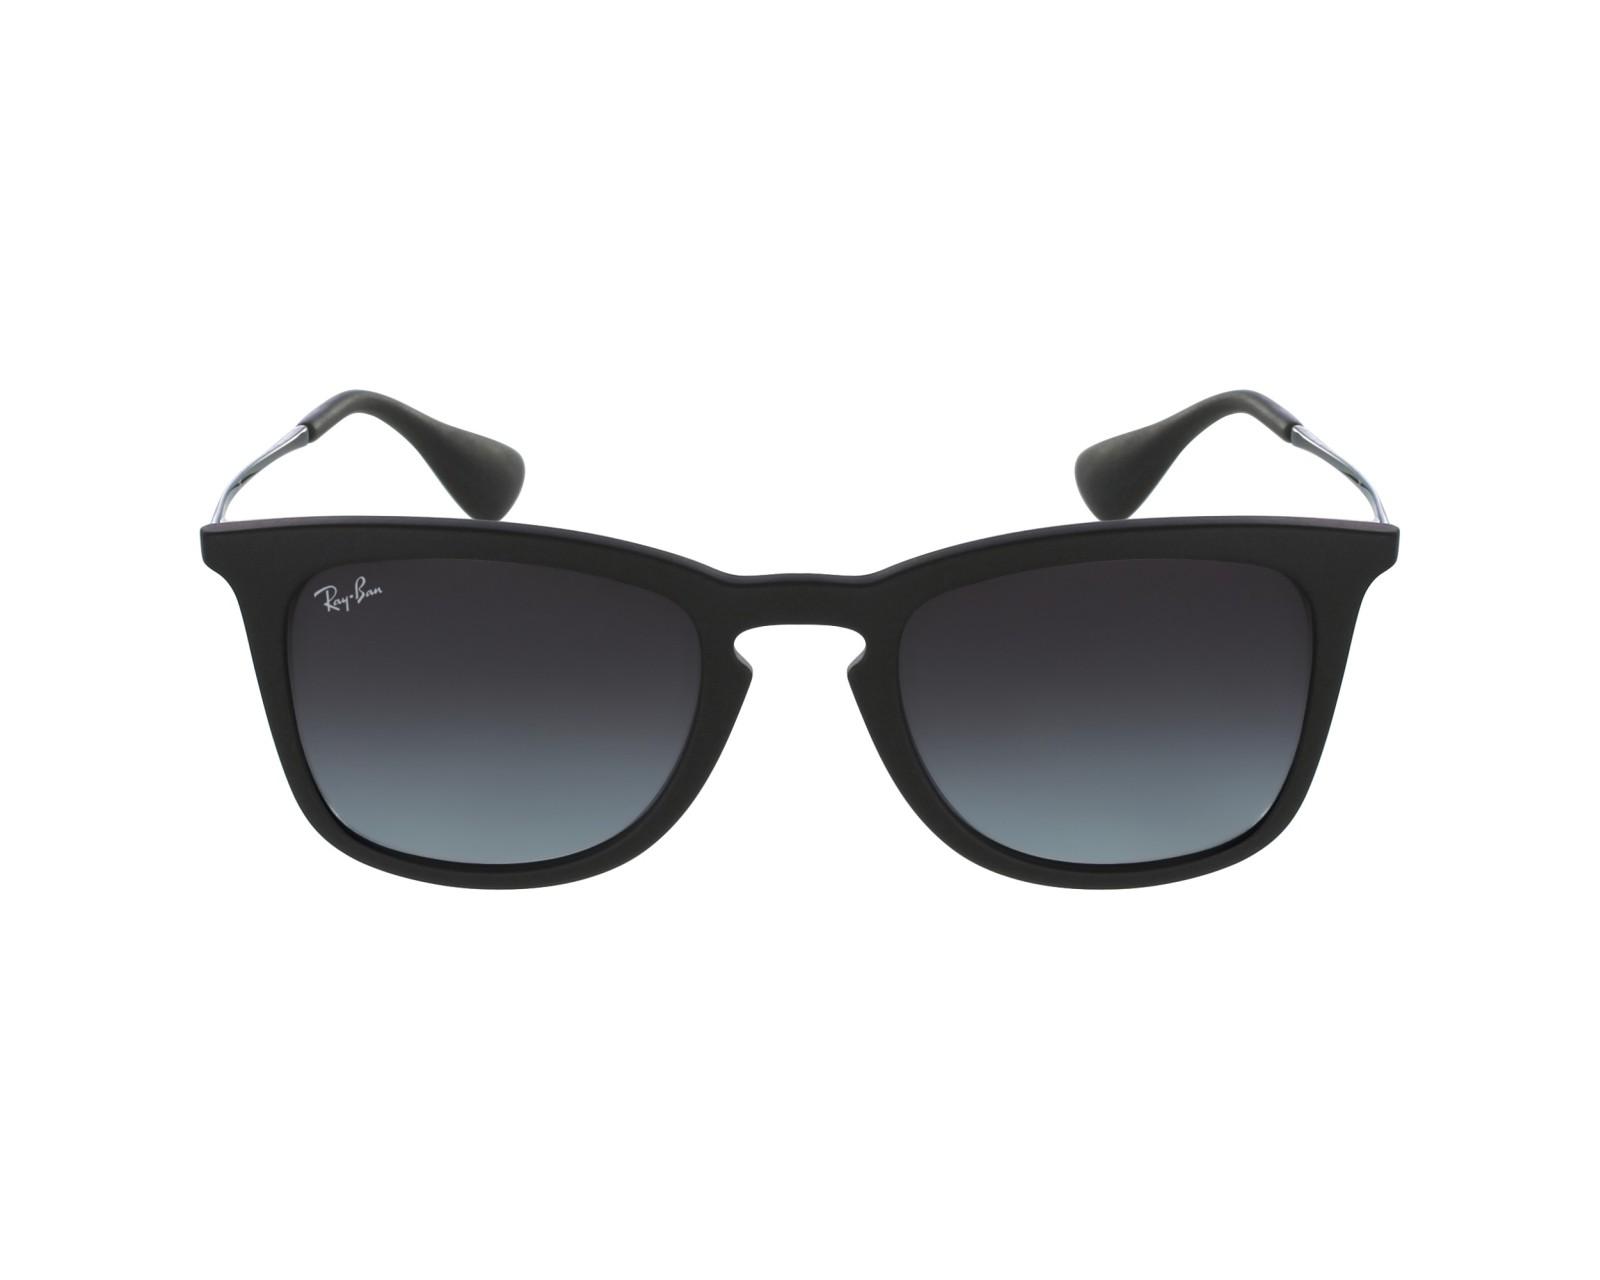 ef4d8f0339c Sunglasses Ray-Ban RB-4221 622 8G 50-19 Black profile view